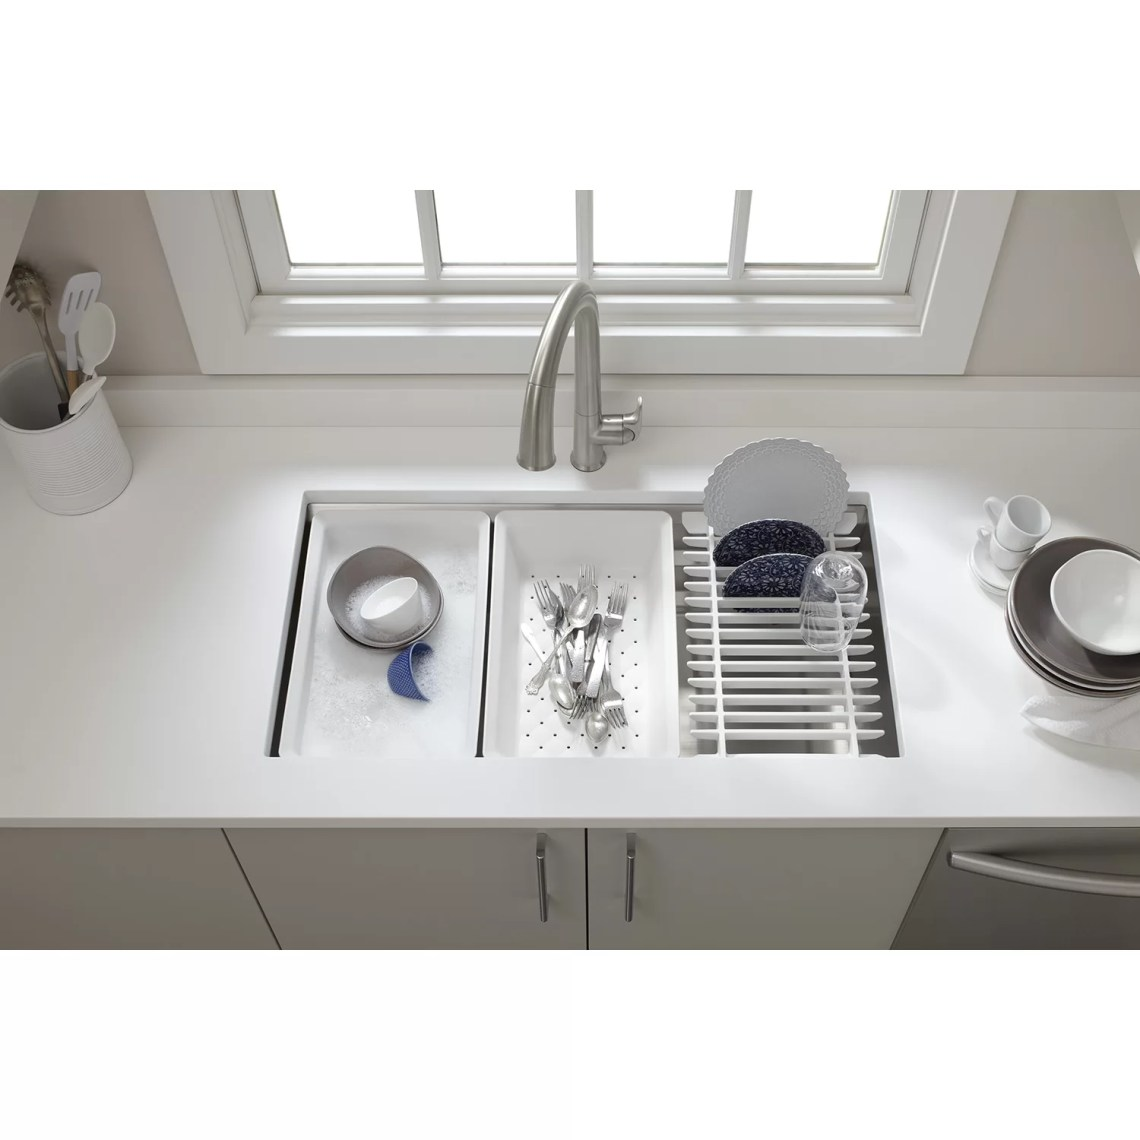 Image Result For Sleek Kitchen Price List